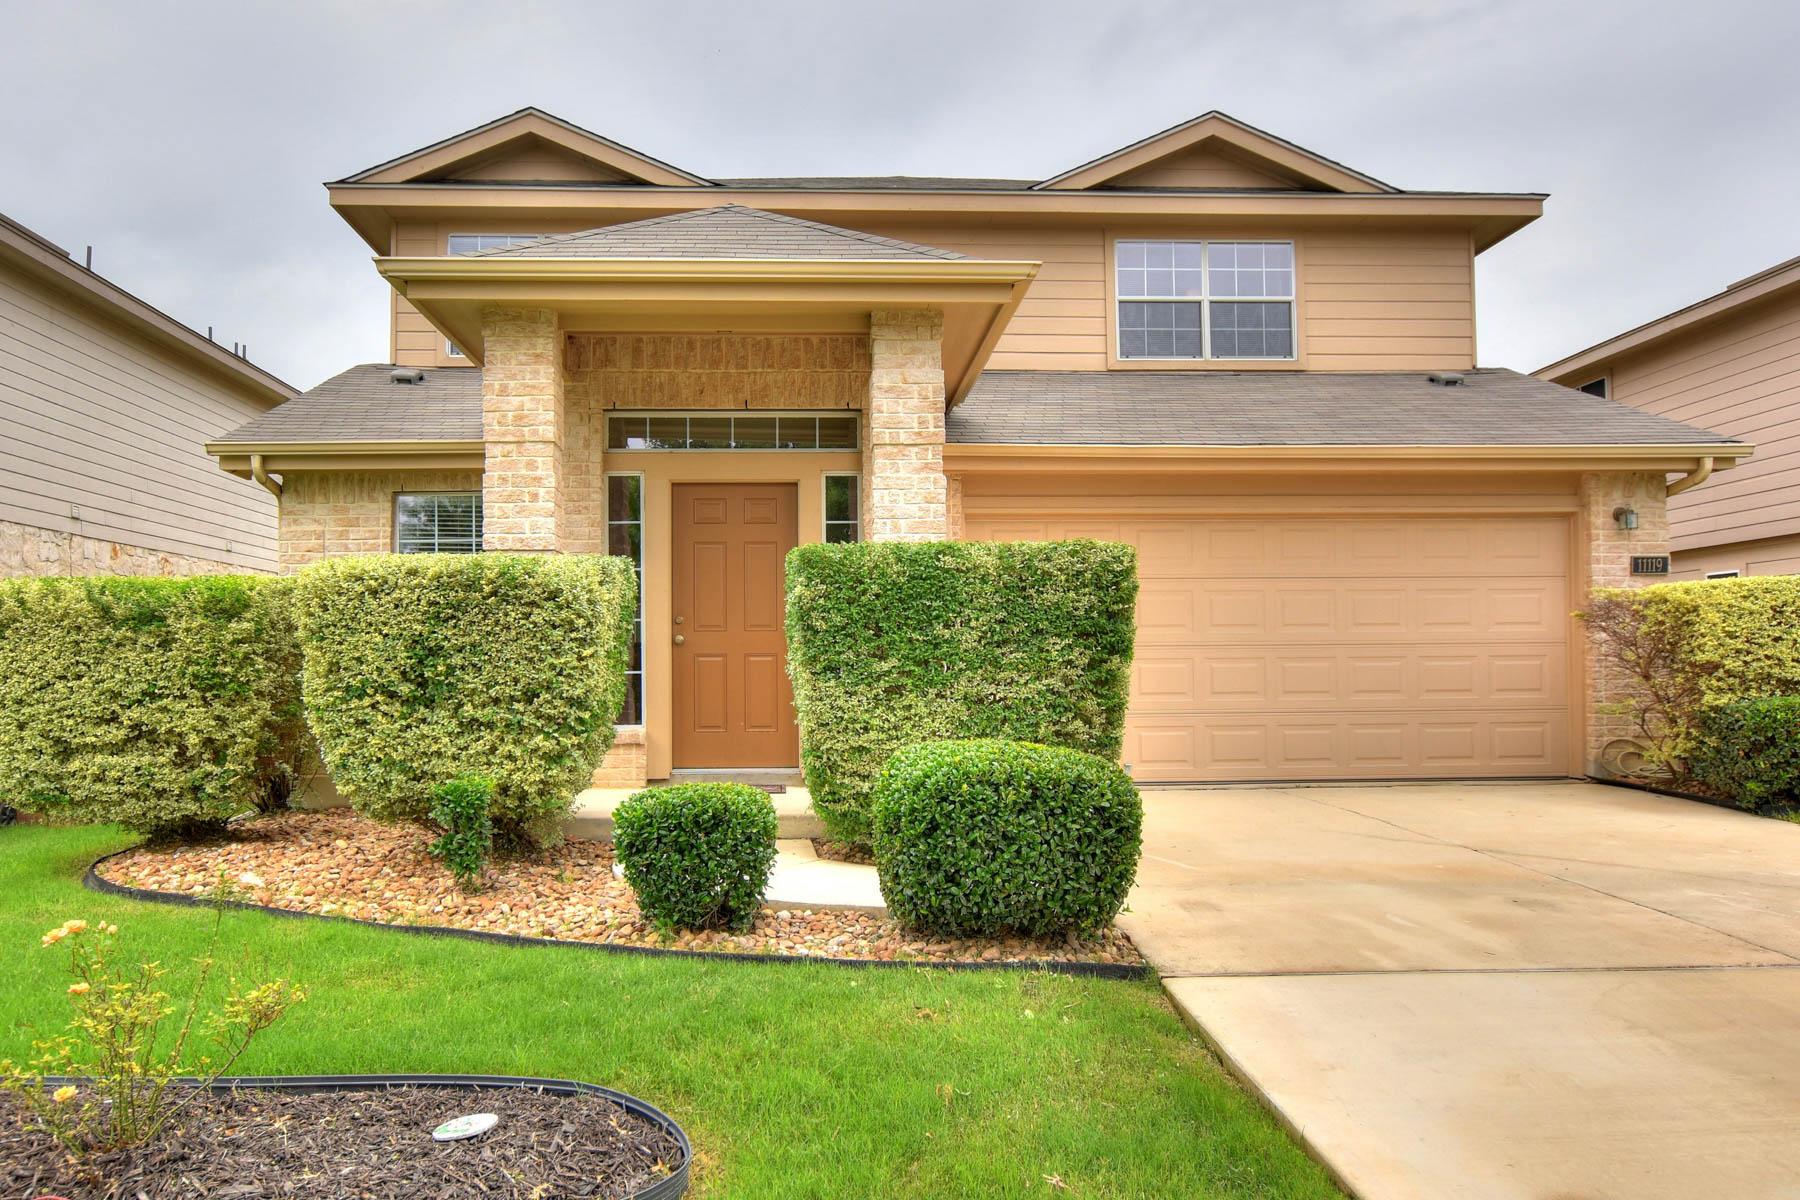 独户住宅 为 销售 在 Great Home in the Beautiful Wildhorse Subdivision 11119 Palomino Bnd Wildhorse, 圣安东尼奥, 得克萨斯州, 78254 美国